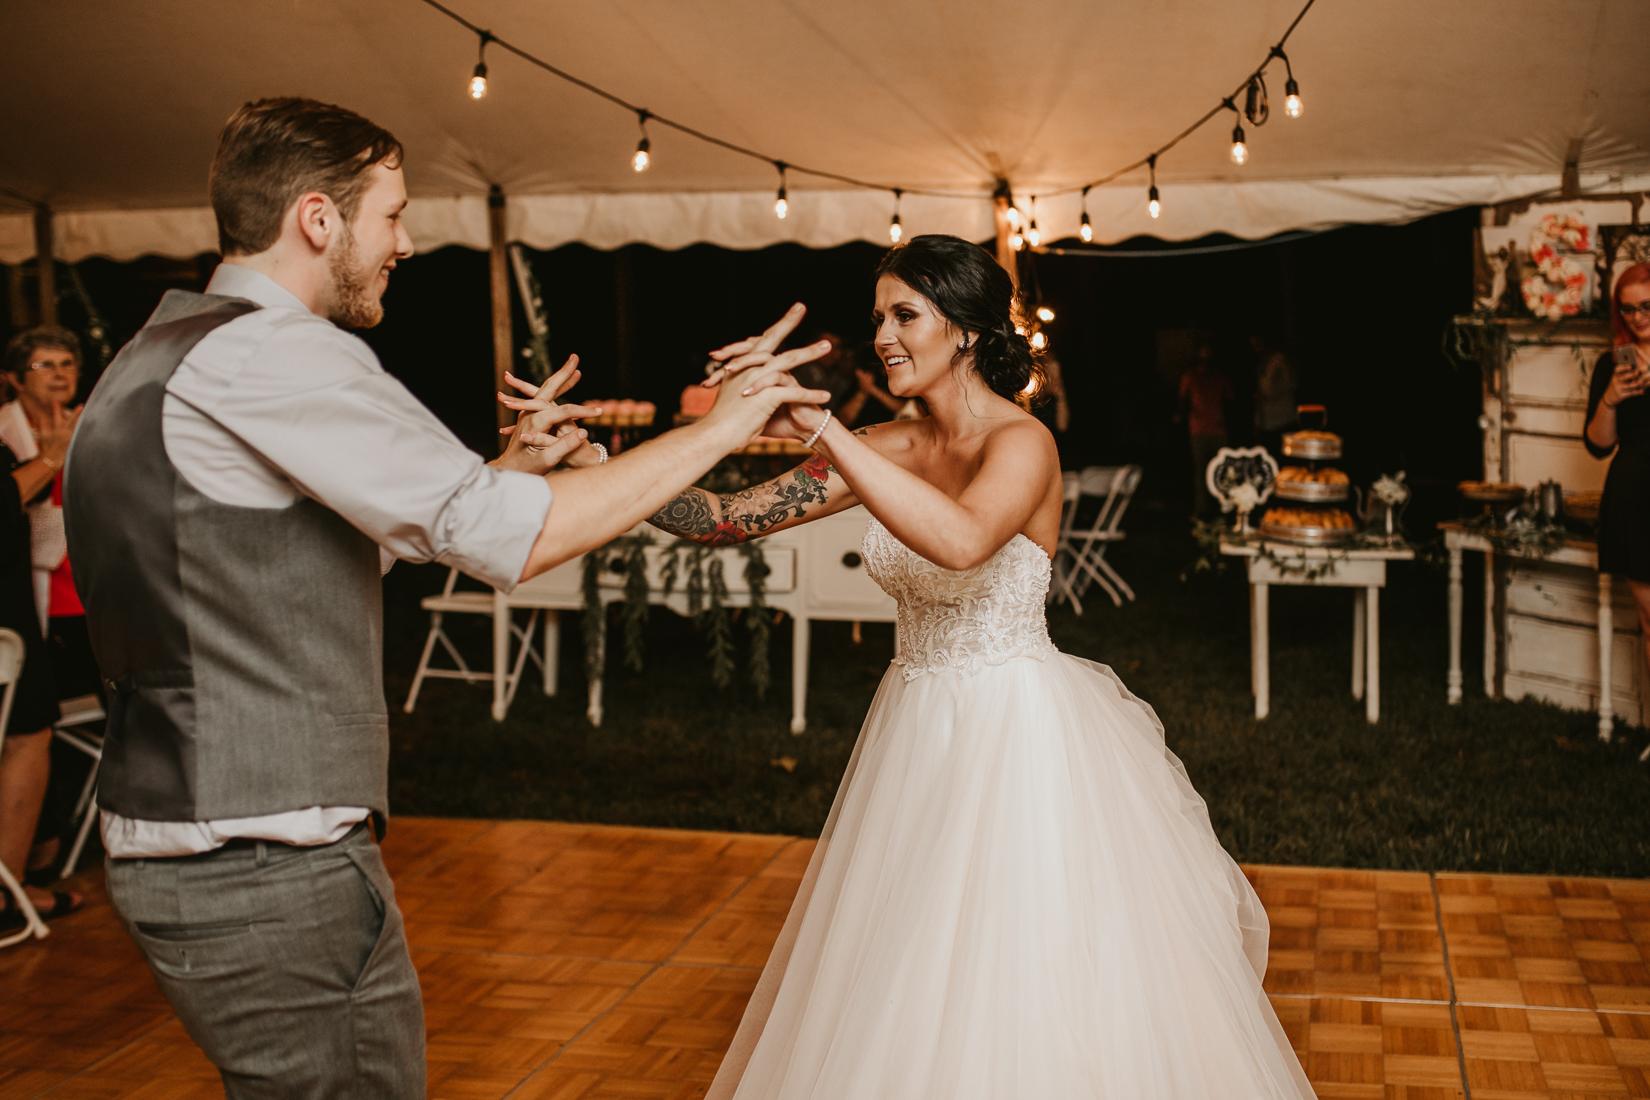 olivia_zay_wedding_09_2018-8953.jpg